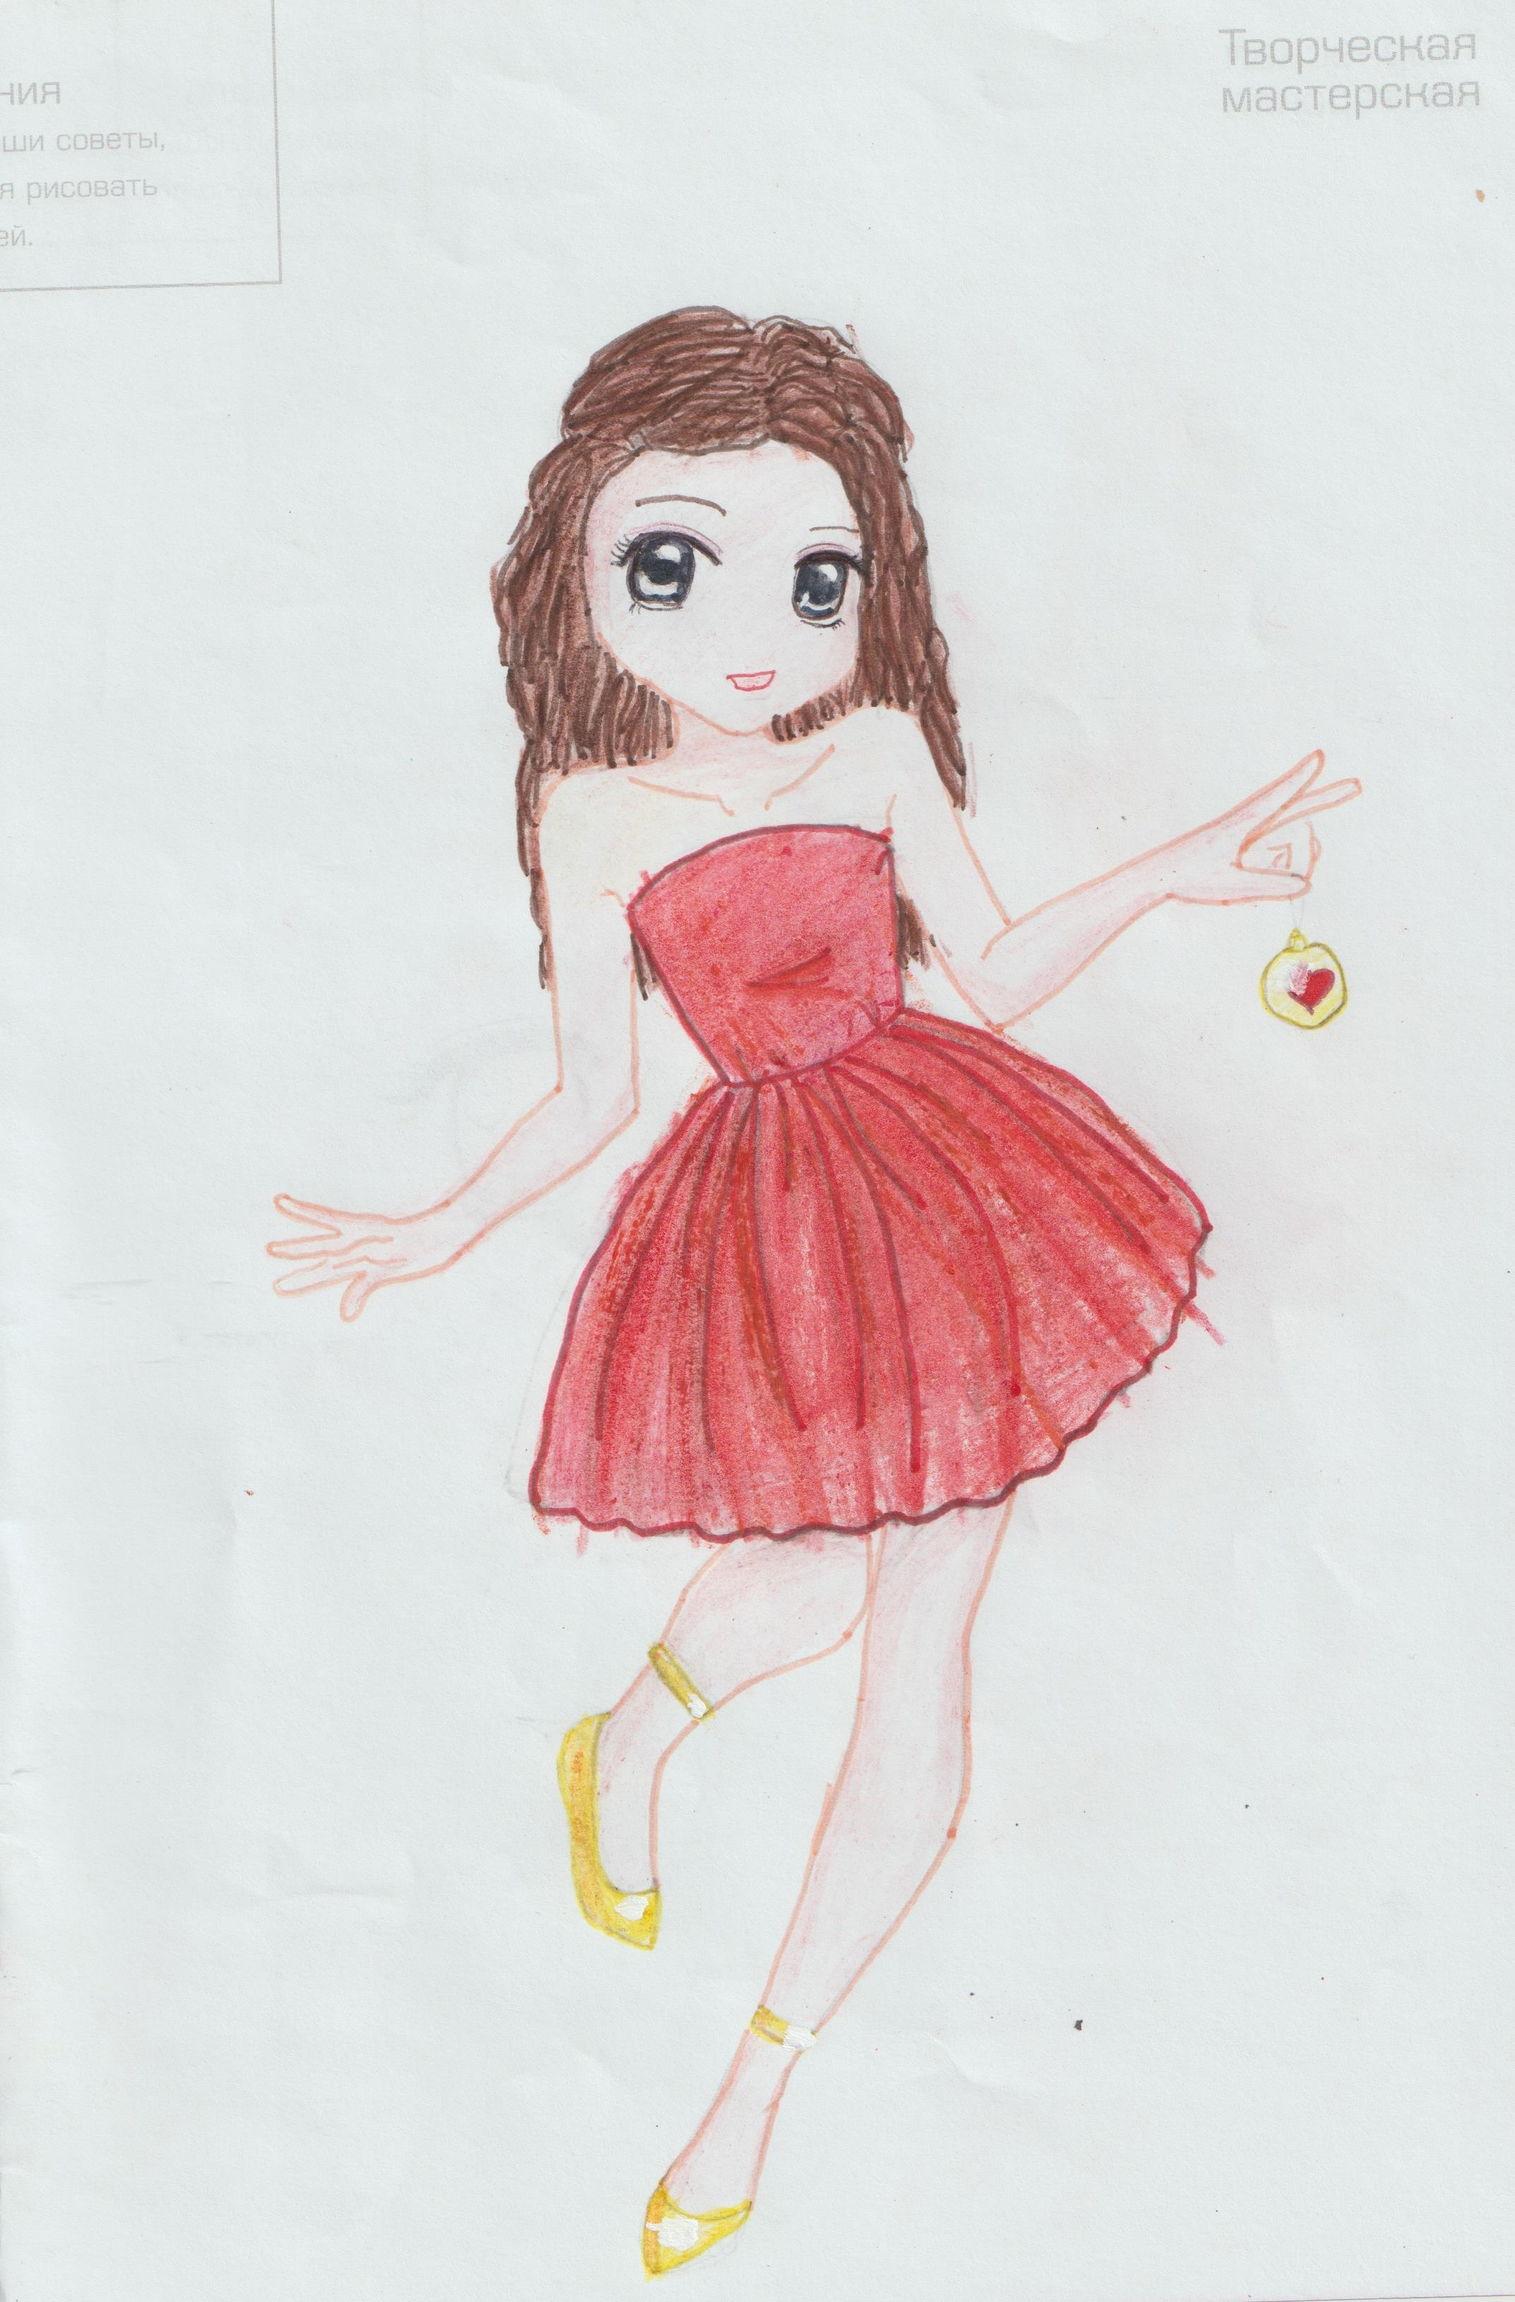 Аня С., 11 Jahre, aus Димитровград